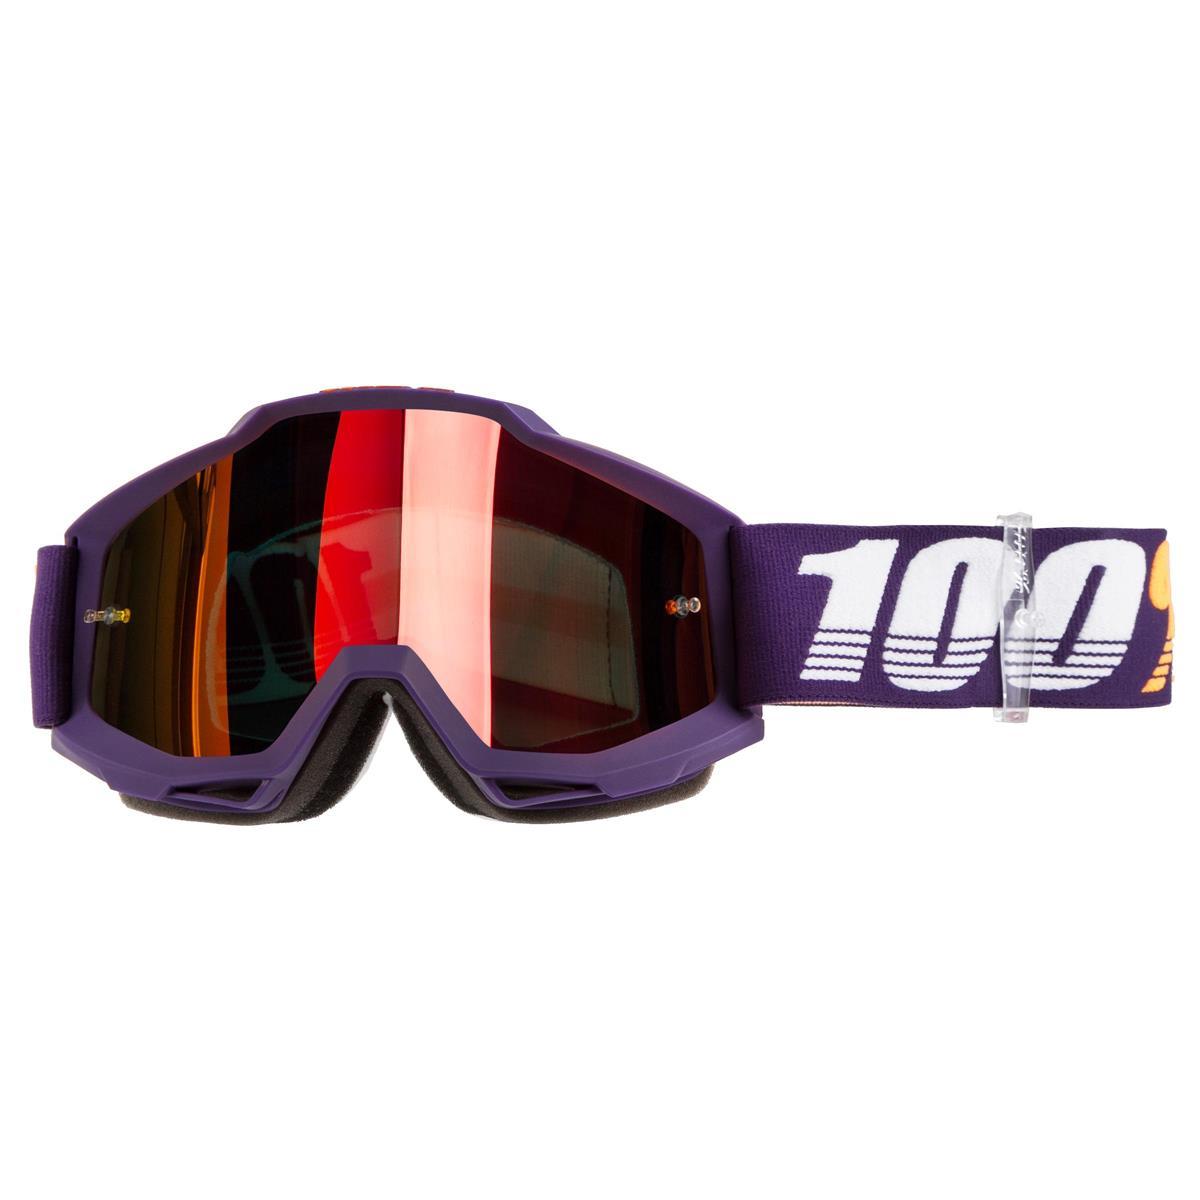 100% Crossbrille The Accuri Grib - Rot verspiegelt Anti-Fog